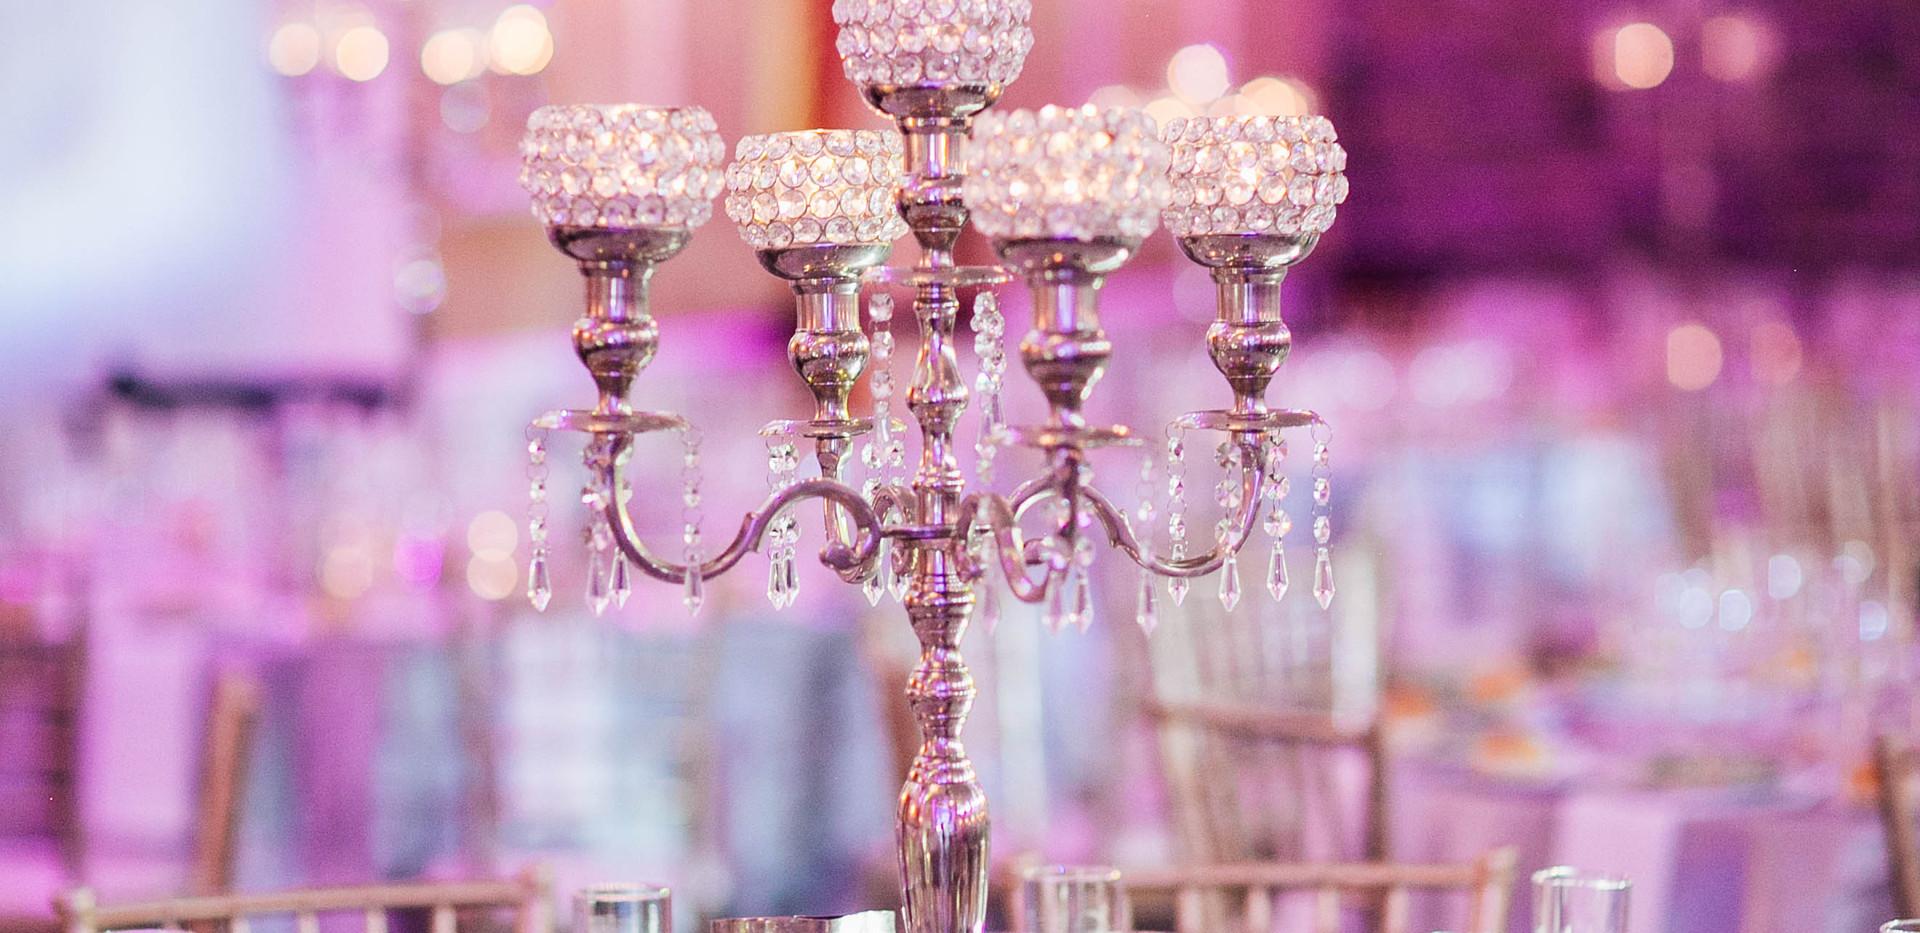 Hmailton Manor Wedding Reception Setting